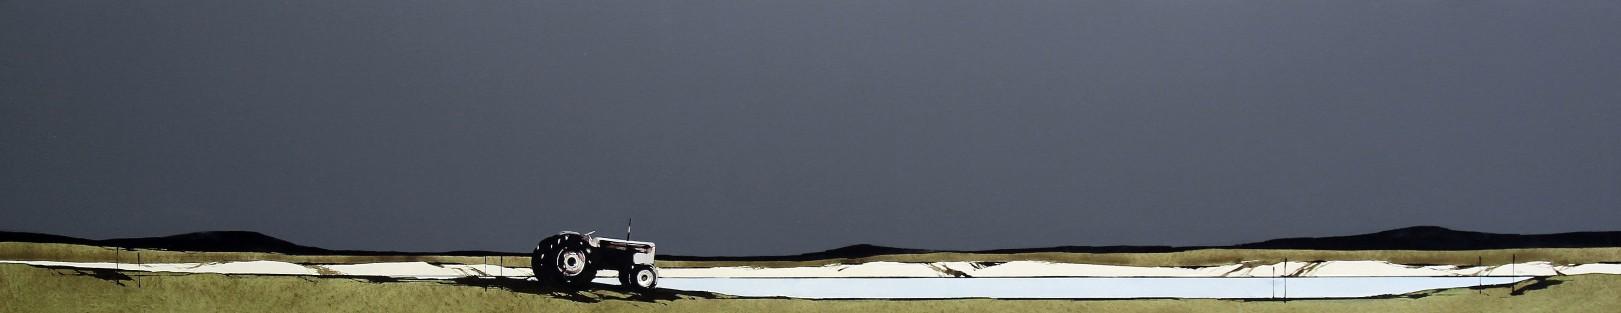 Ron Lawson_Abandoned Tractor_EAS587_Watercolour & Gouache_9x46.5